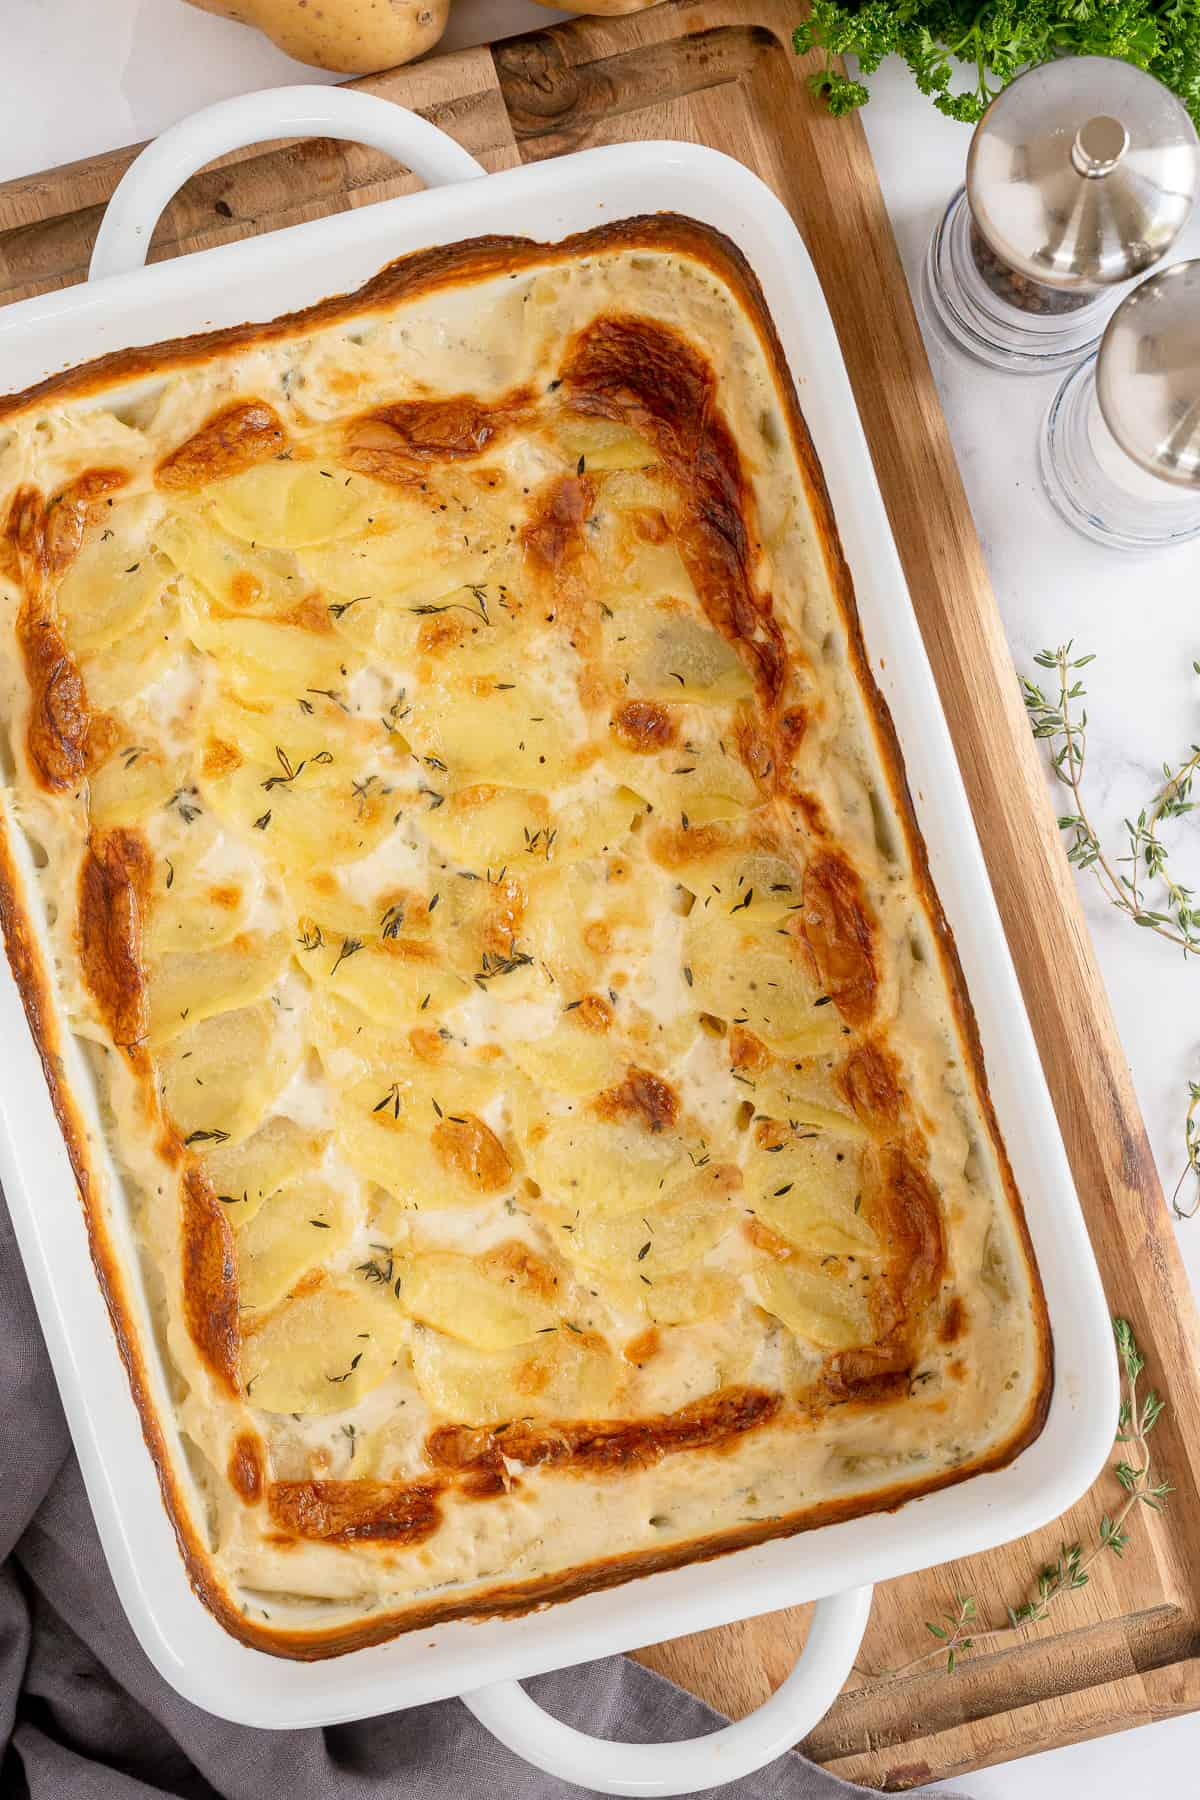 A casserole dish of Scalloped potatoes resting on a cutting board.